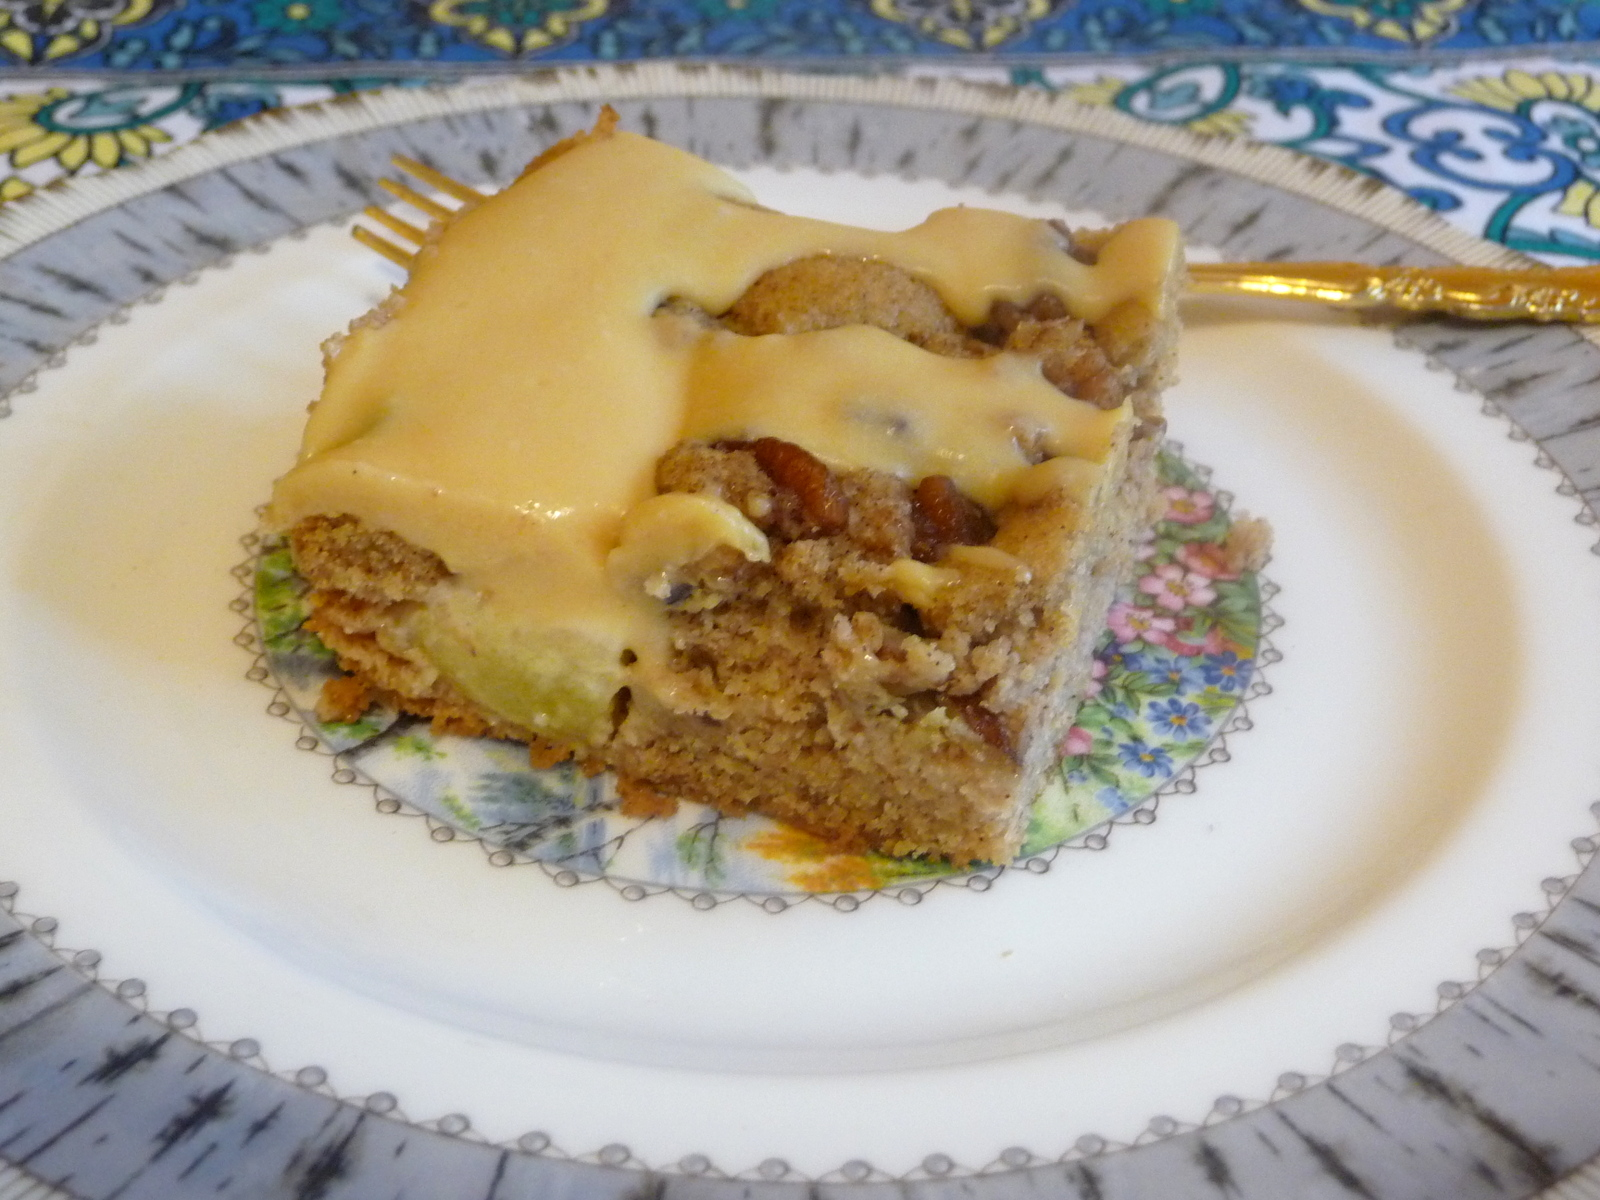 Low Carb Apple Cake Recipes: SPLENDID LOW-CARBING BY JENNIFER ELOFF: APPLE CINNAMON